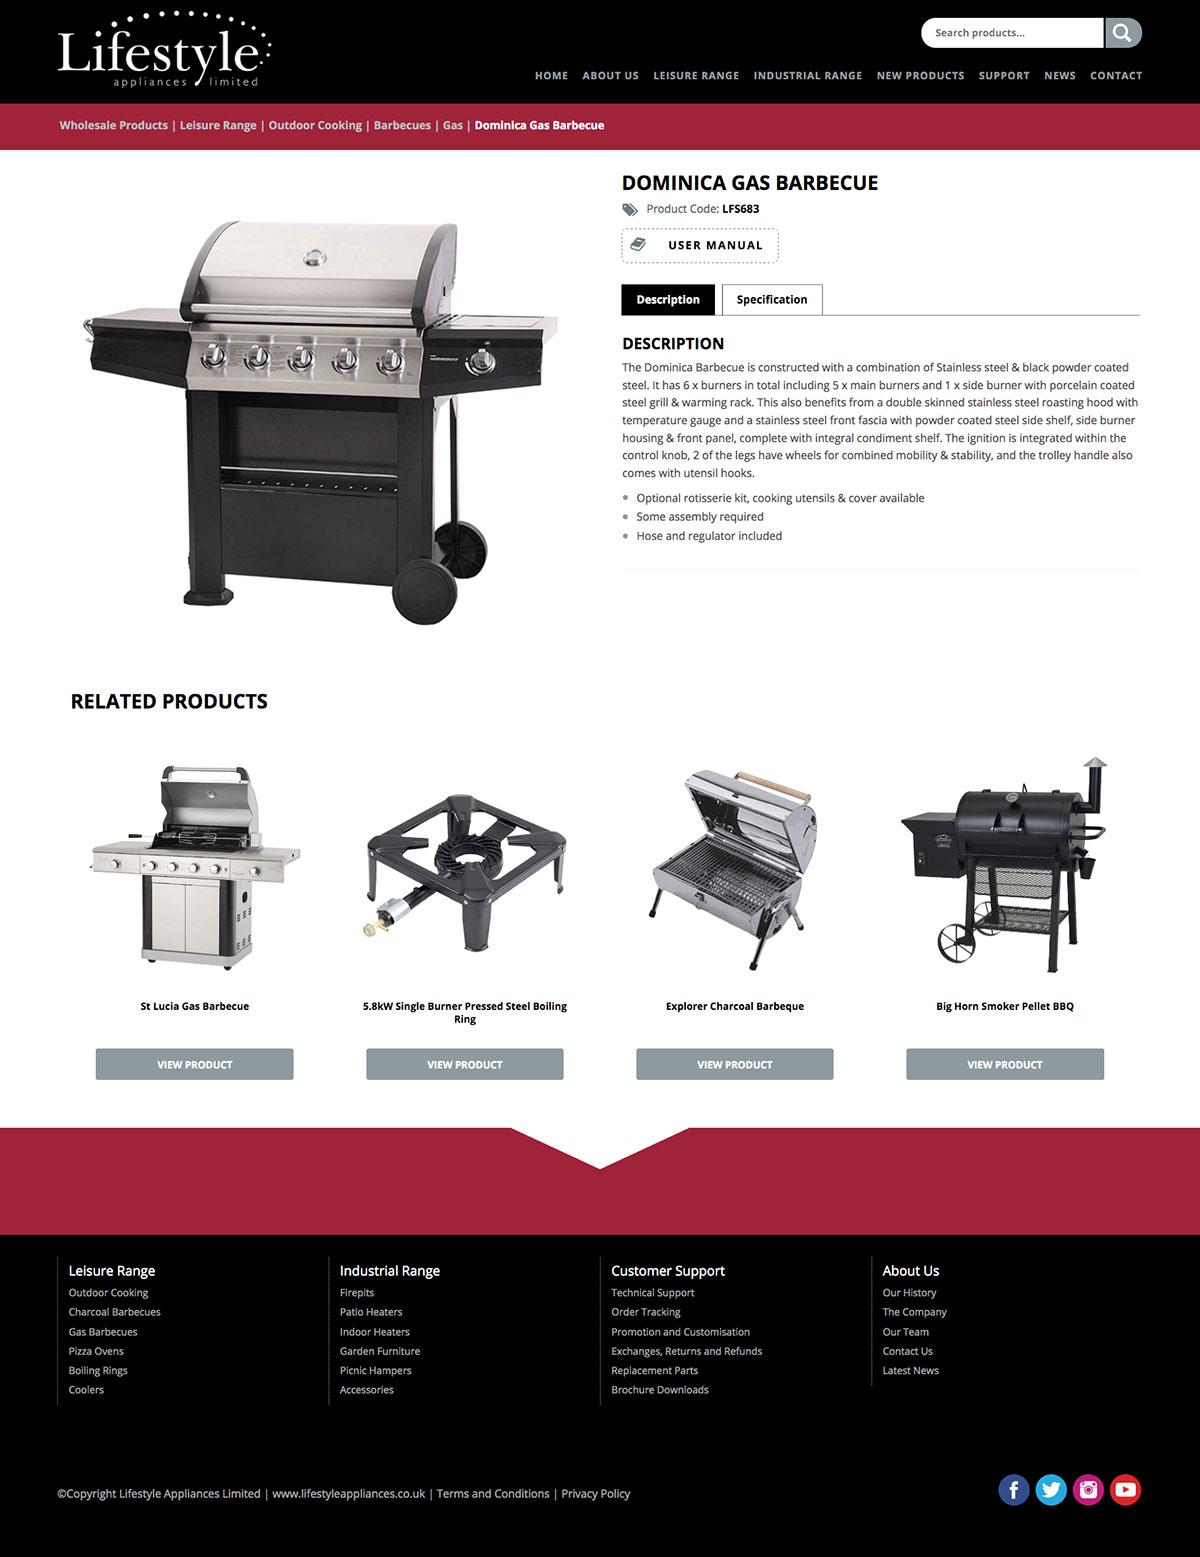 Lifestyle Appliances Online Brochure Website